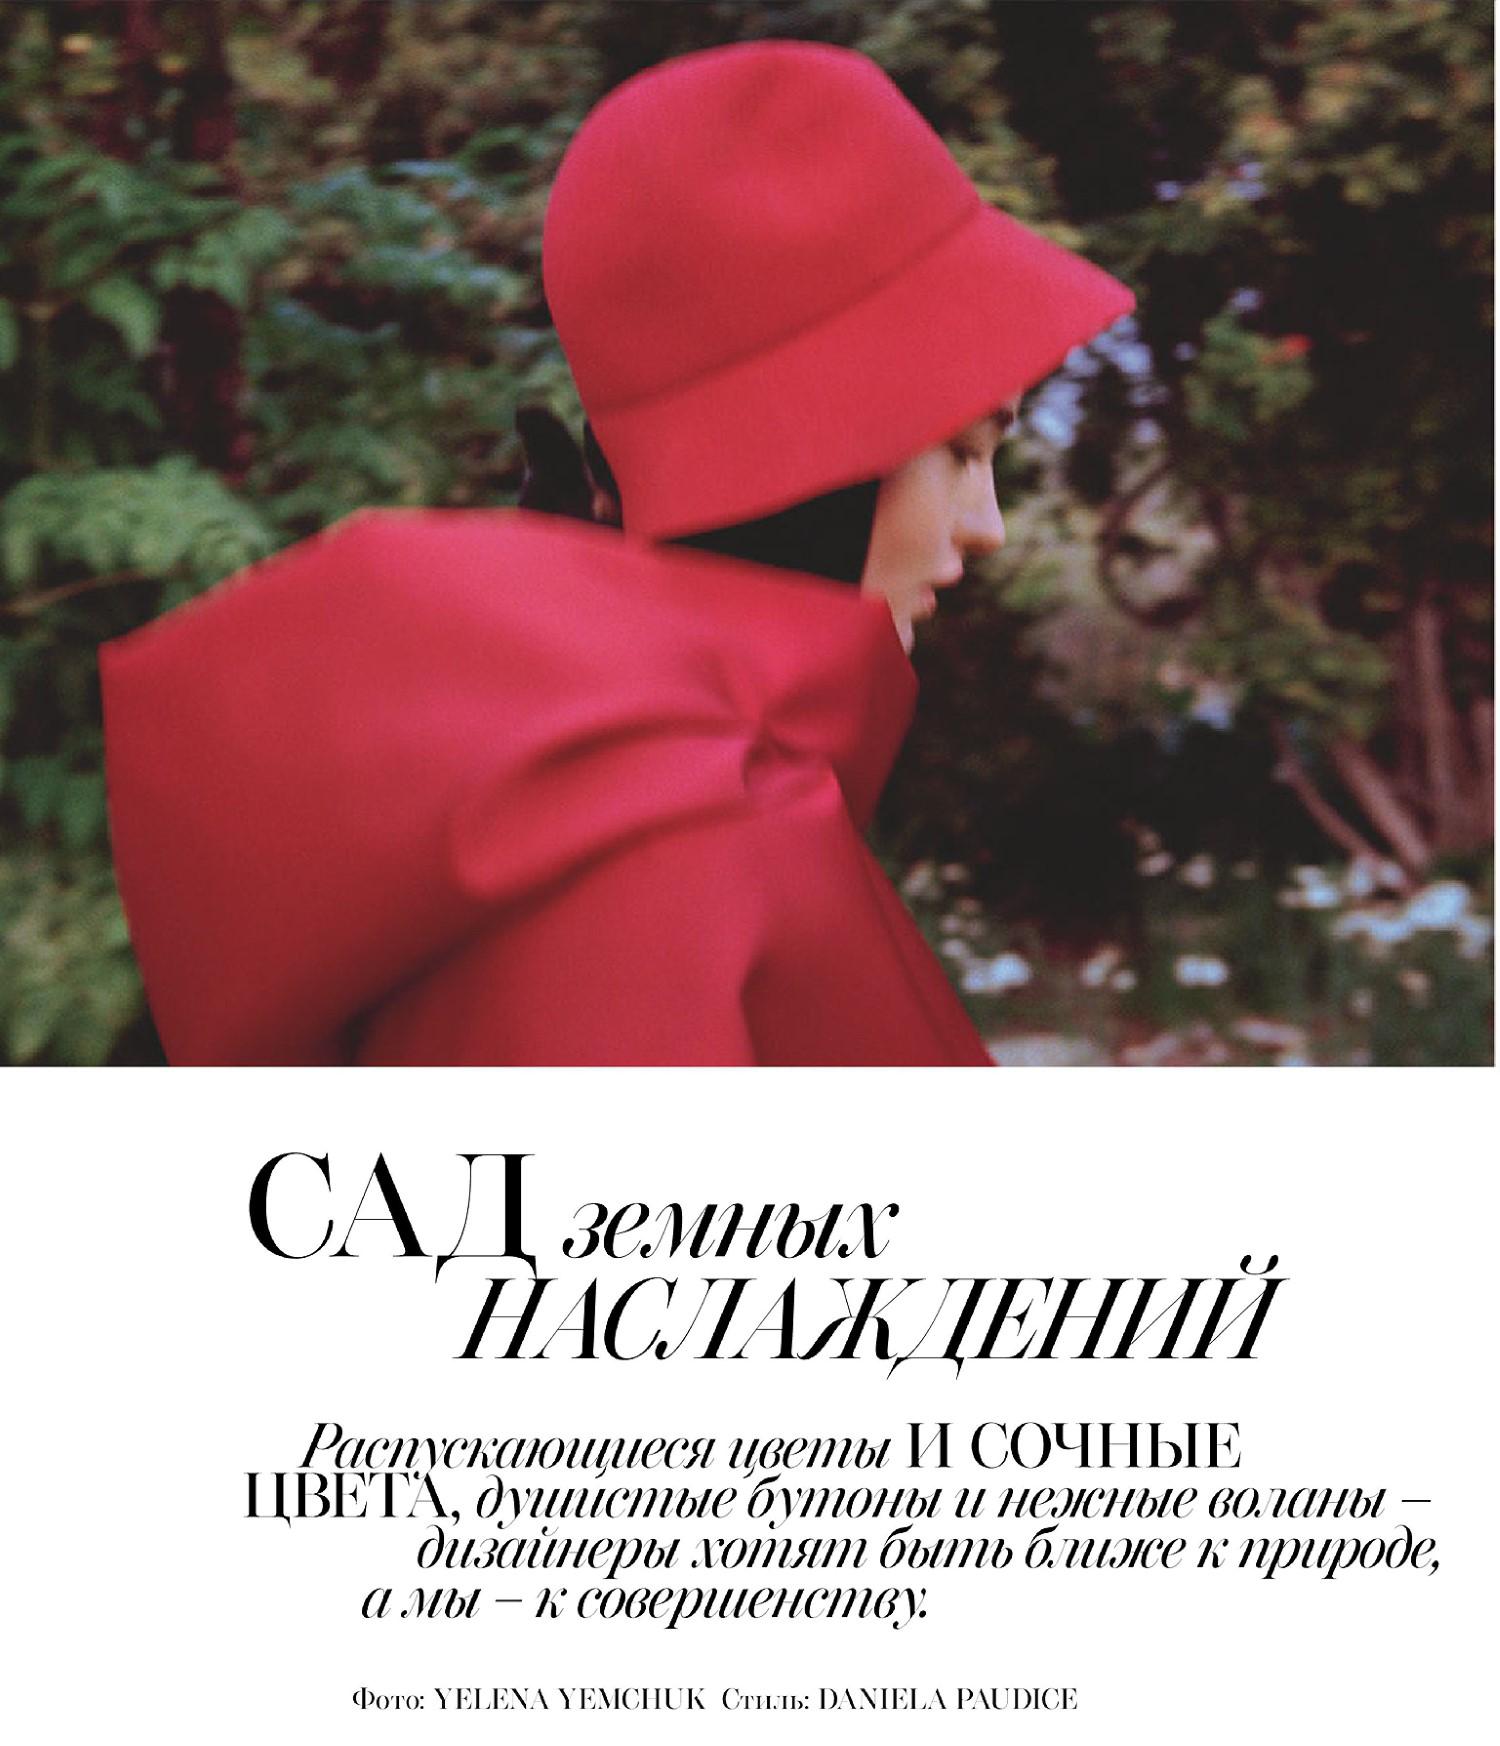 Grace-Elizabeth-Yelena-Yemchuk-Vogue-Russia-April-2019 (5).jpg